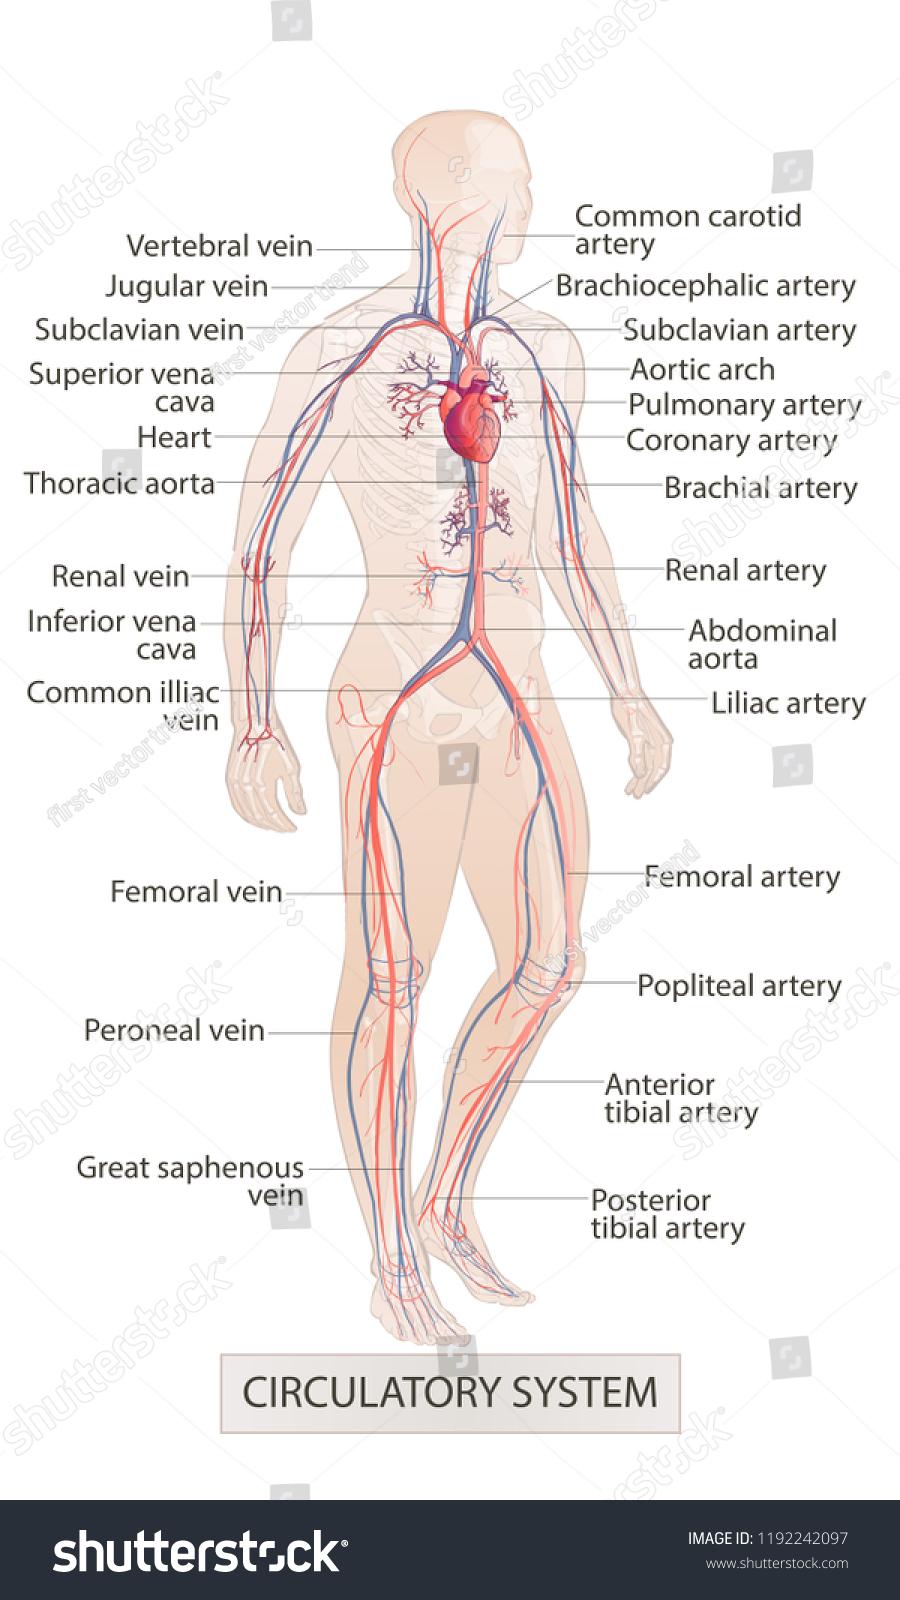 medium resolution of human body parts circulatory vascular system man anatomy hand drown sketch illustration isolated